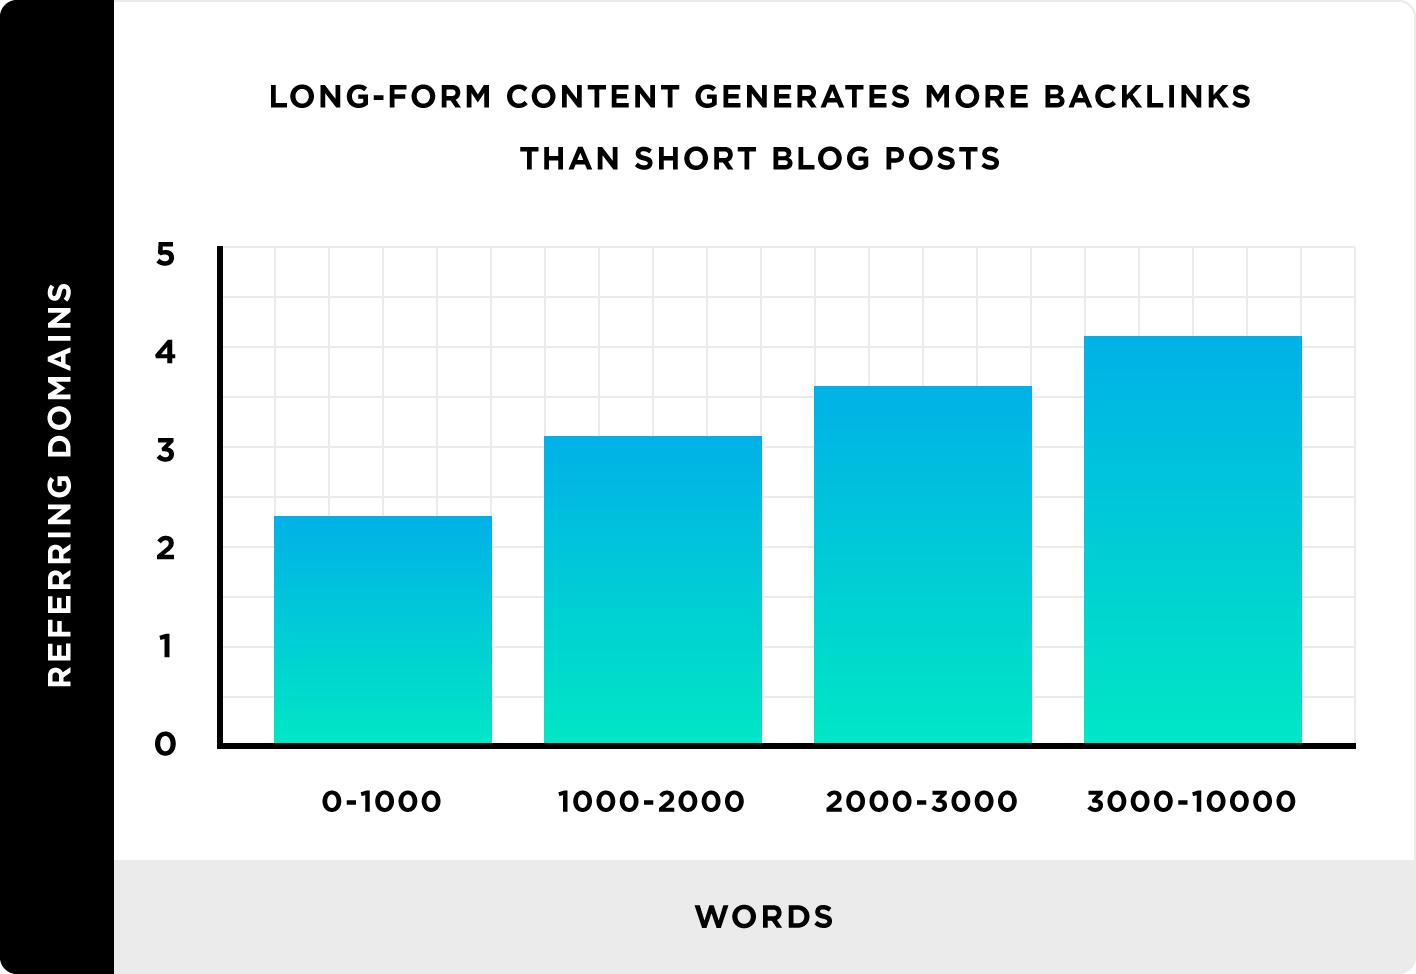 Long-form content generates more backlinks than short blog posts